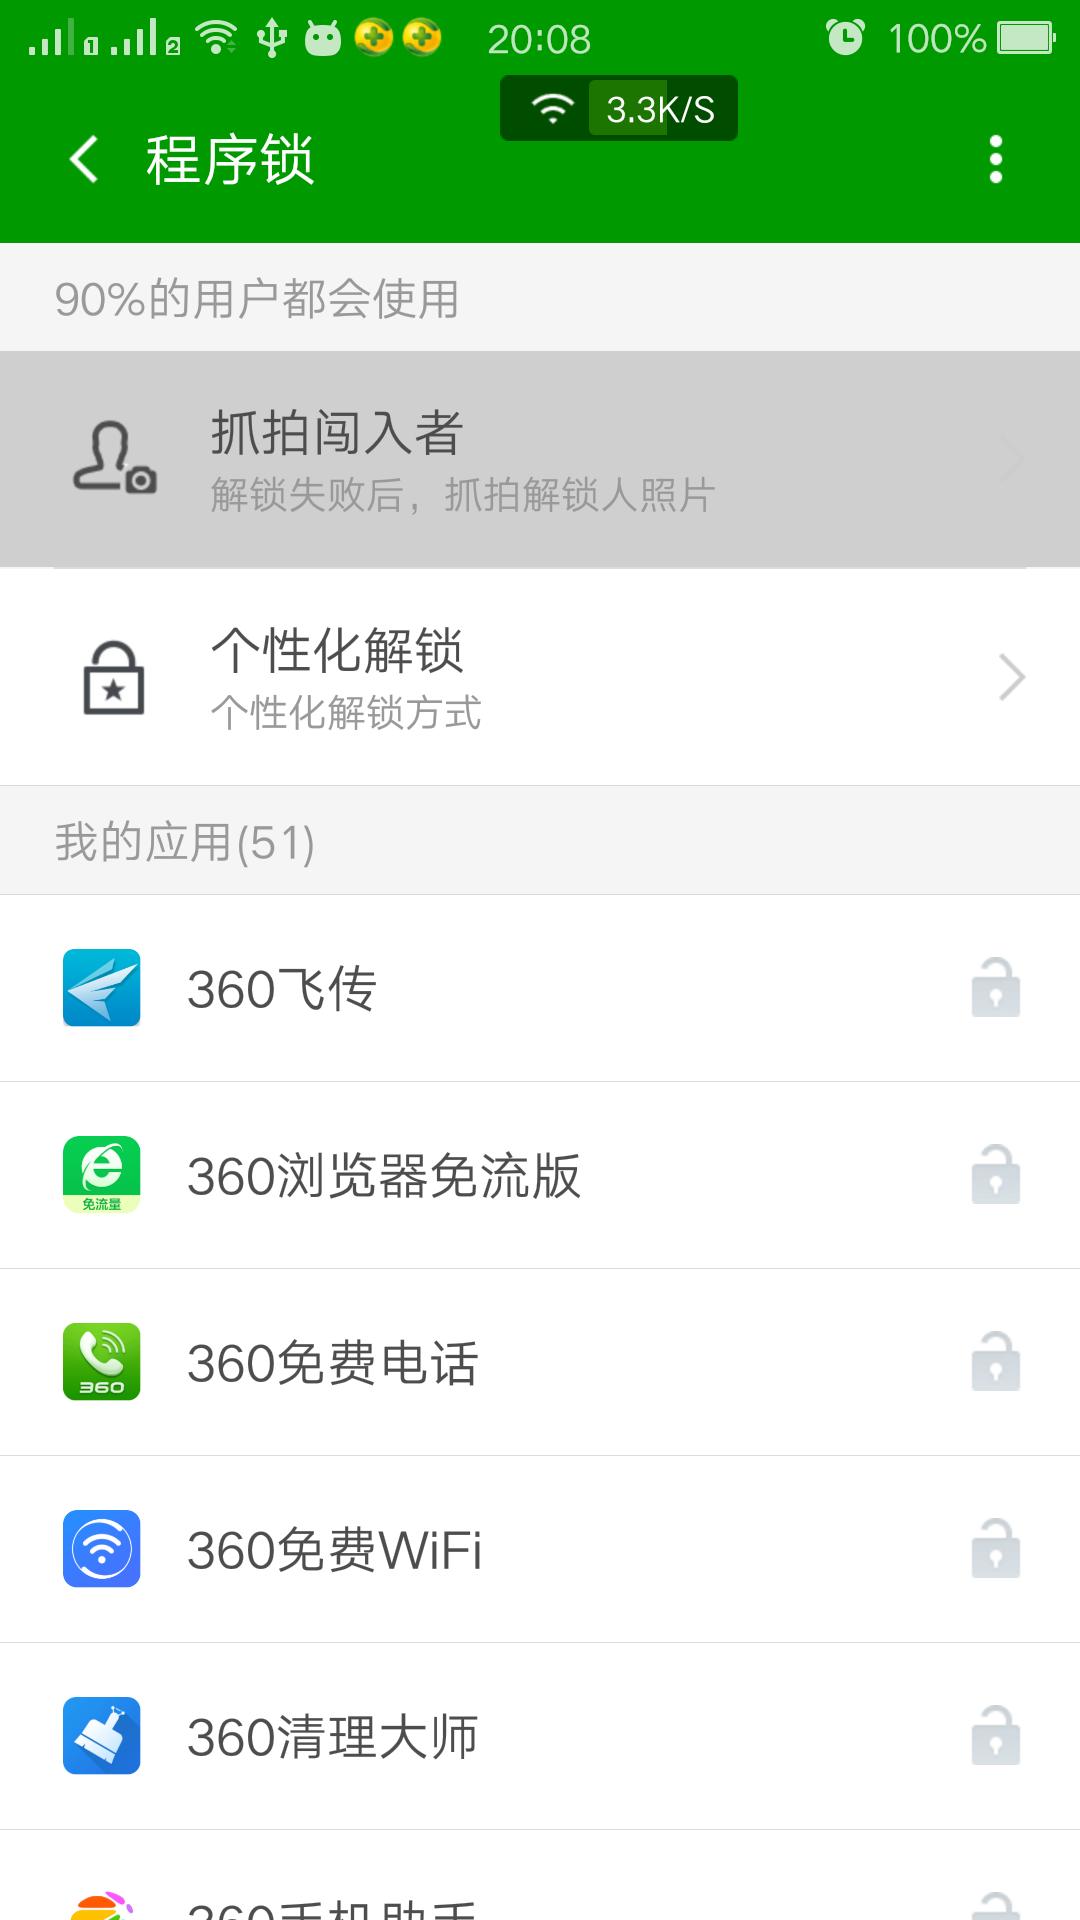 Screenshot_2015-12-22-20-08-40-153.png